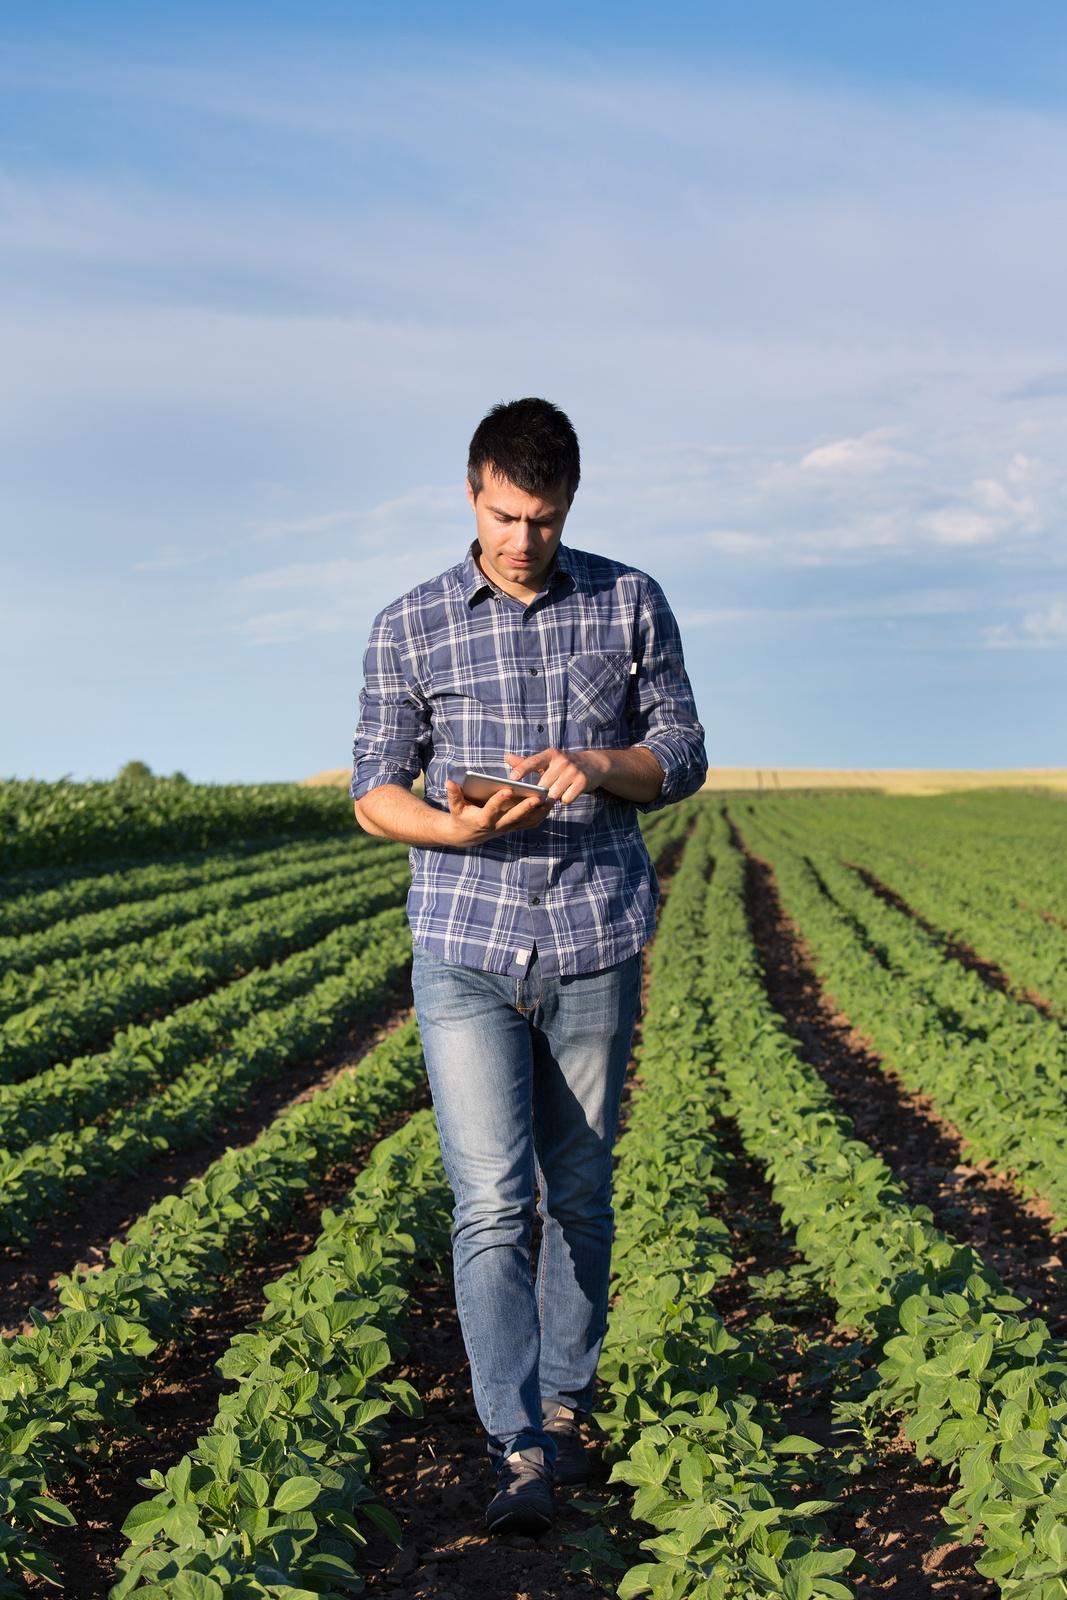 farmer on a tablet outside